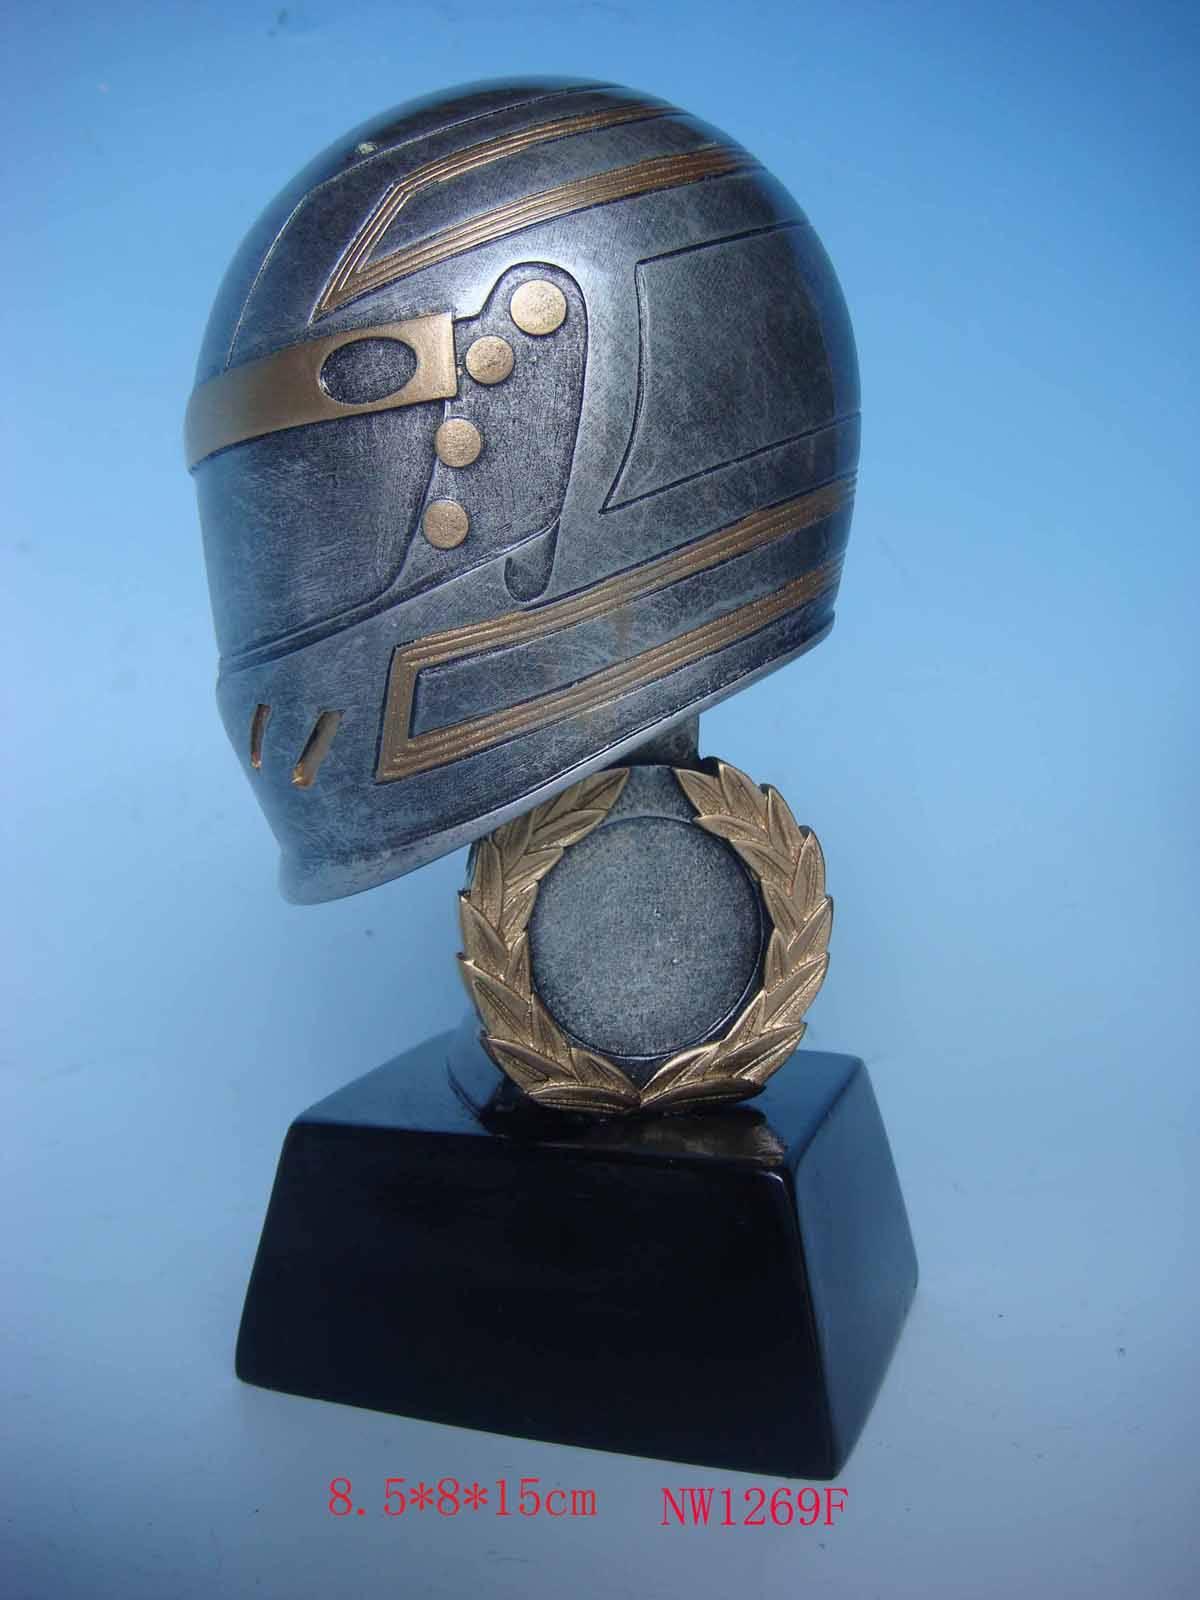 resin helmet statue,helmet figurine,polyresin racing awards,resin awards